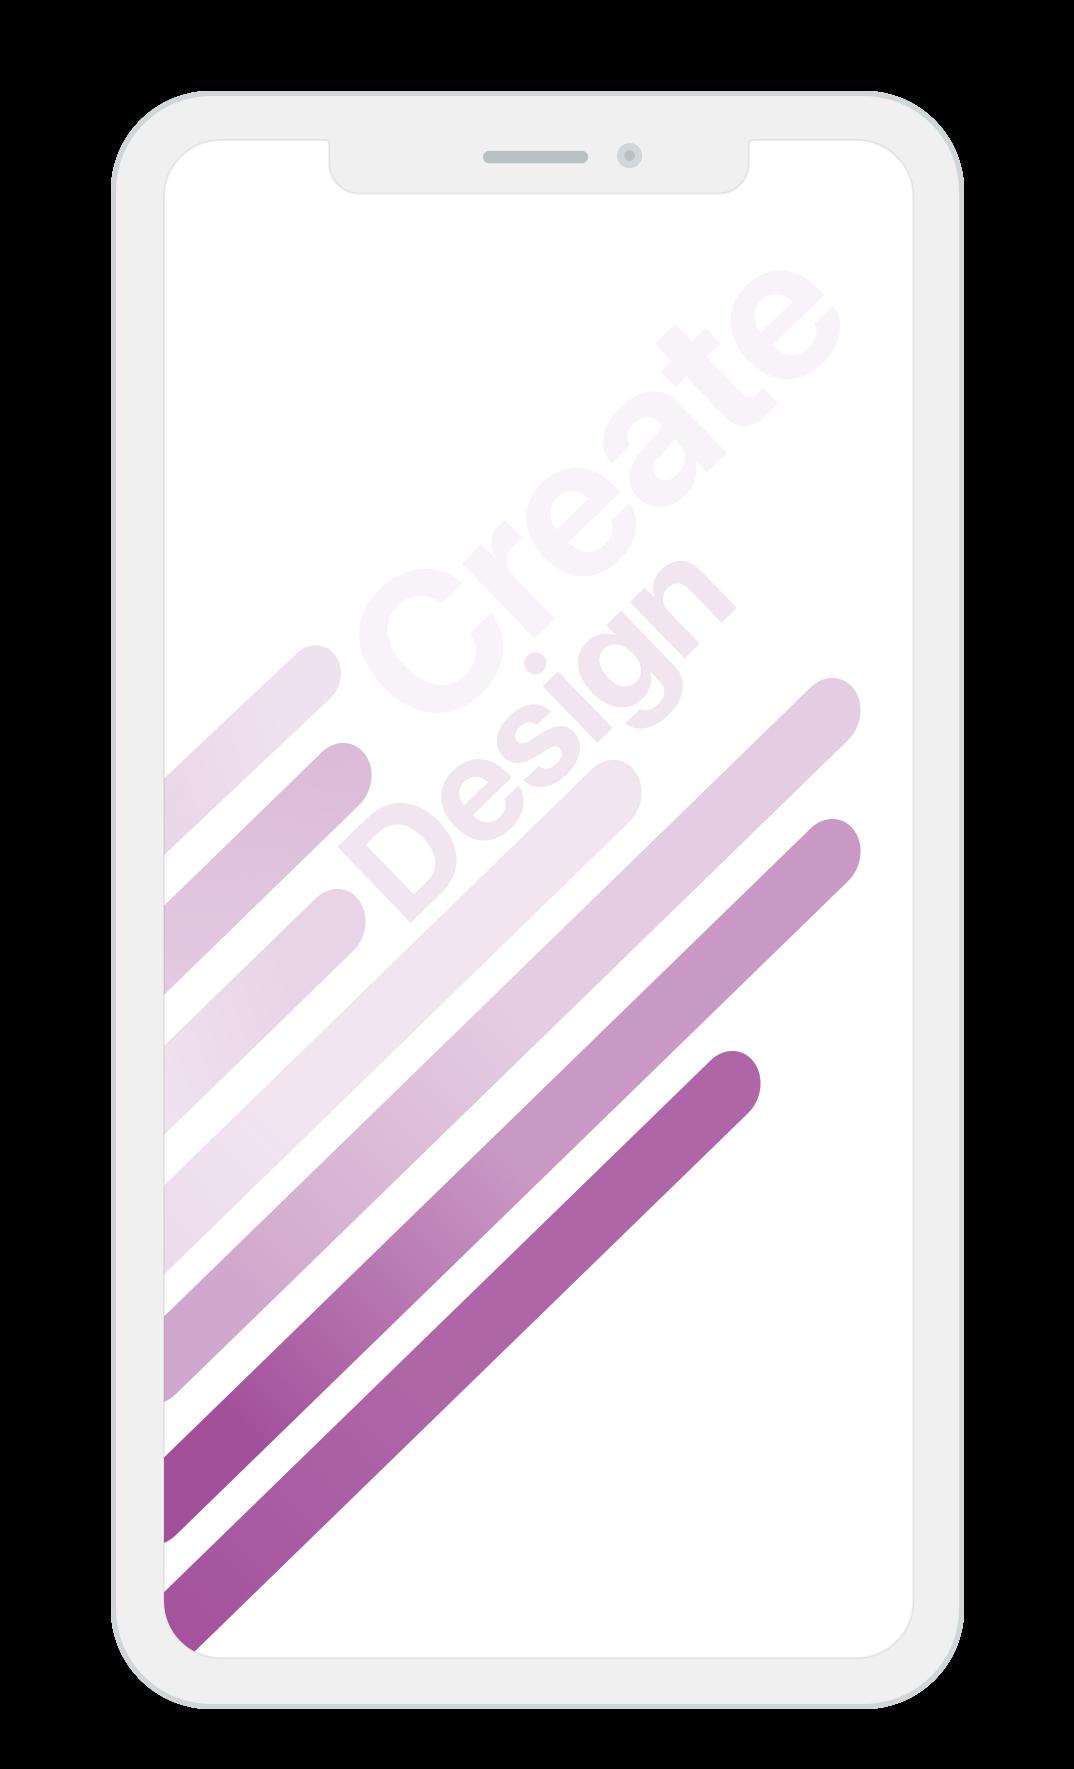 Graphic Design on Phone